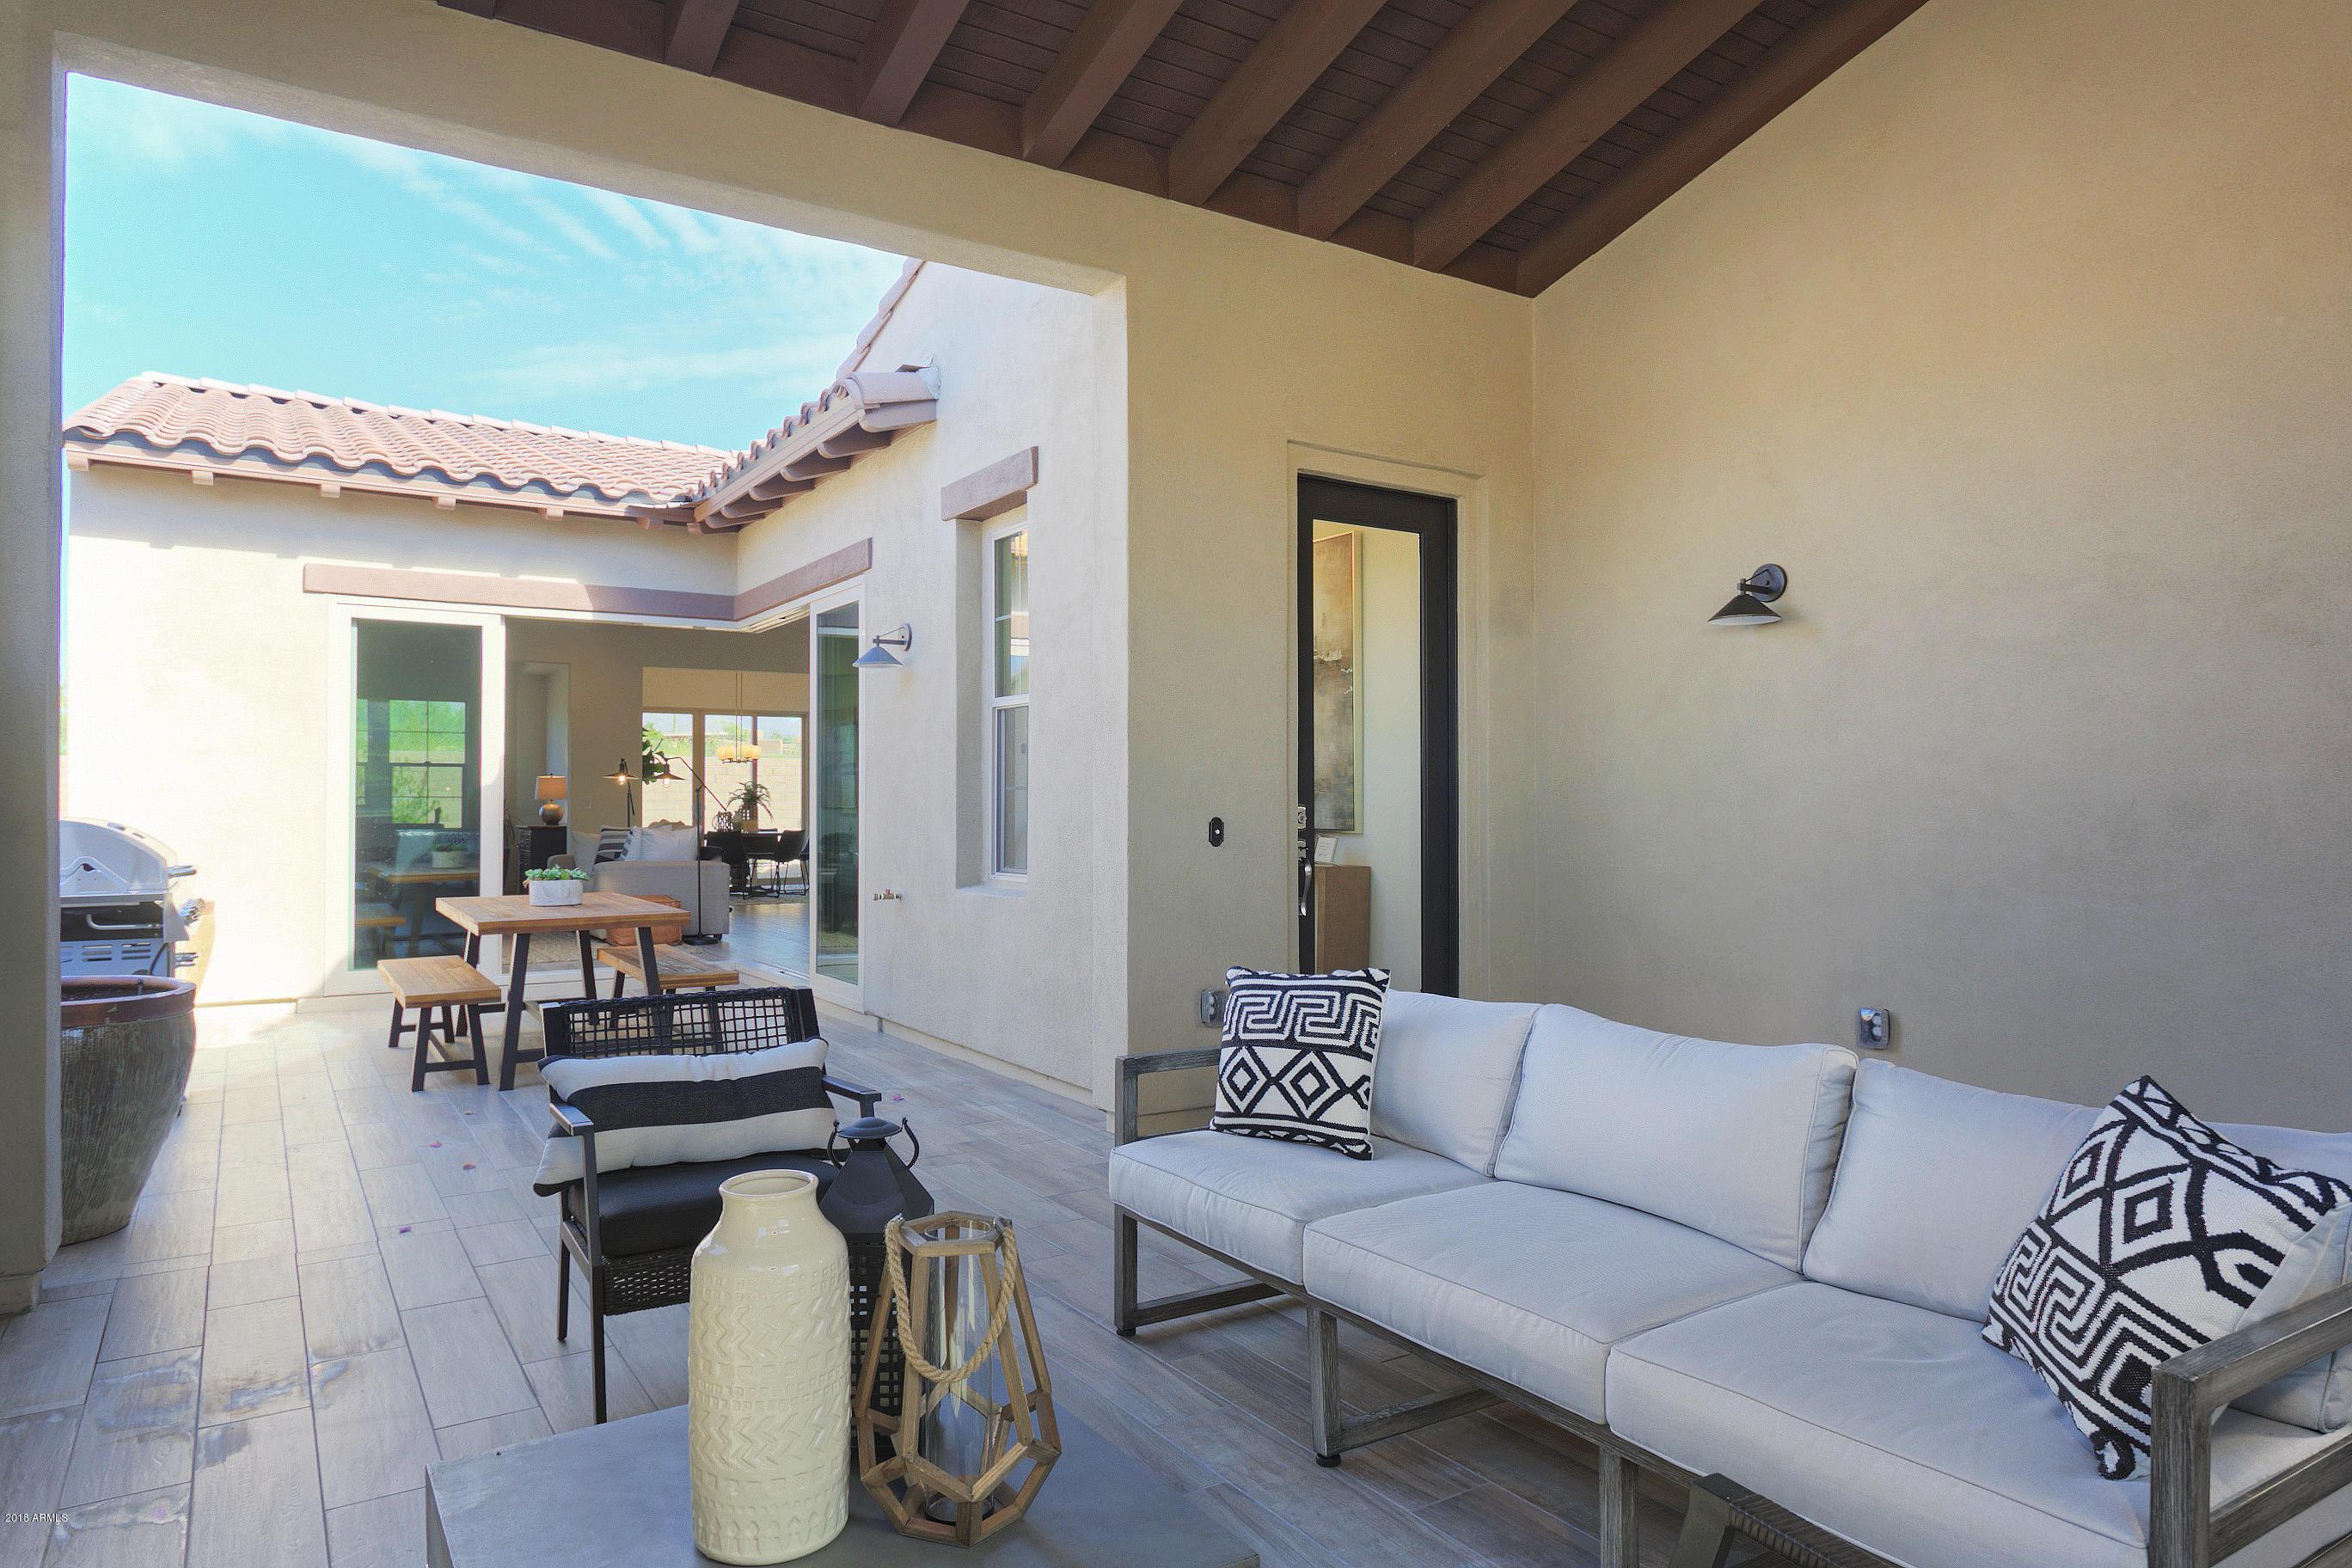 MLS 5830991 8714 E EASTWOOD Circle, Carefree, AZ 85377 Carefree AZ Newly Built